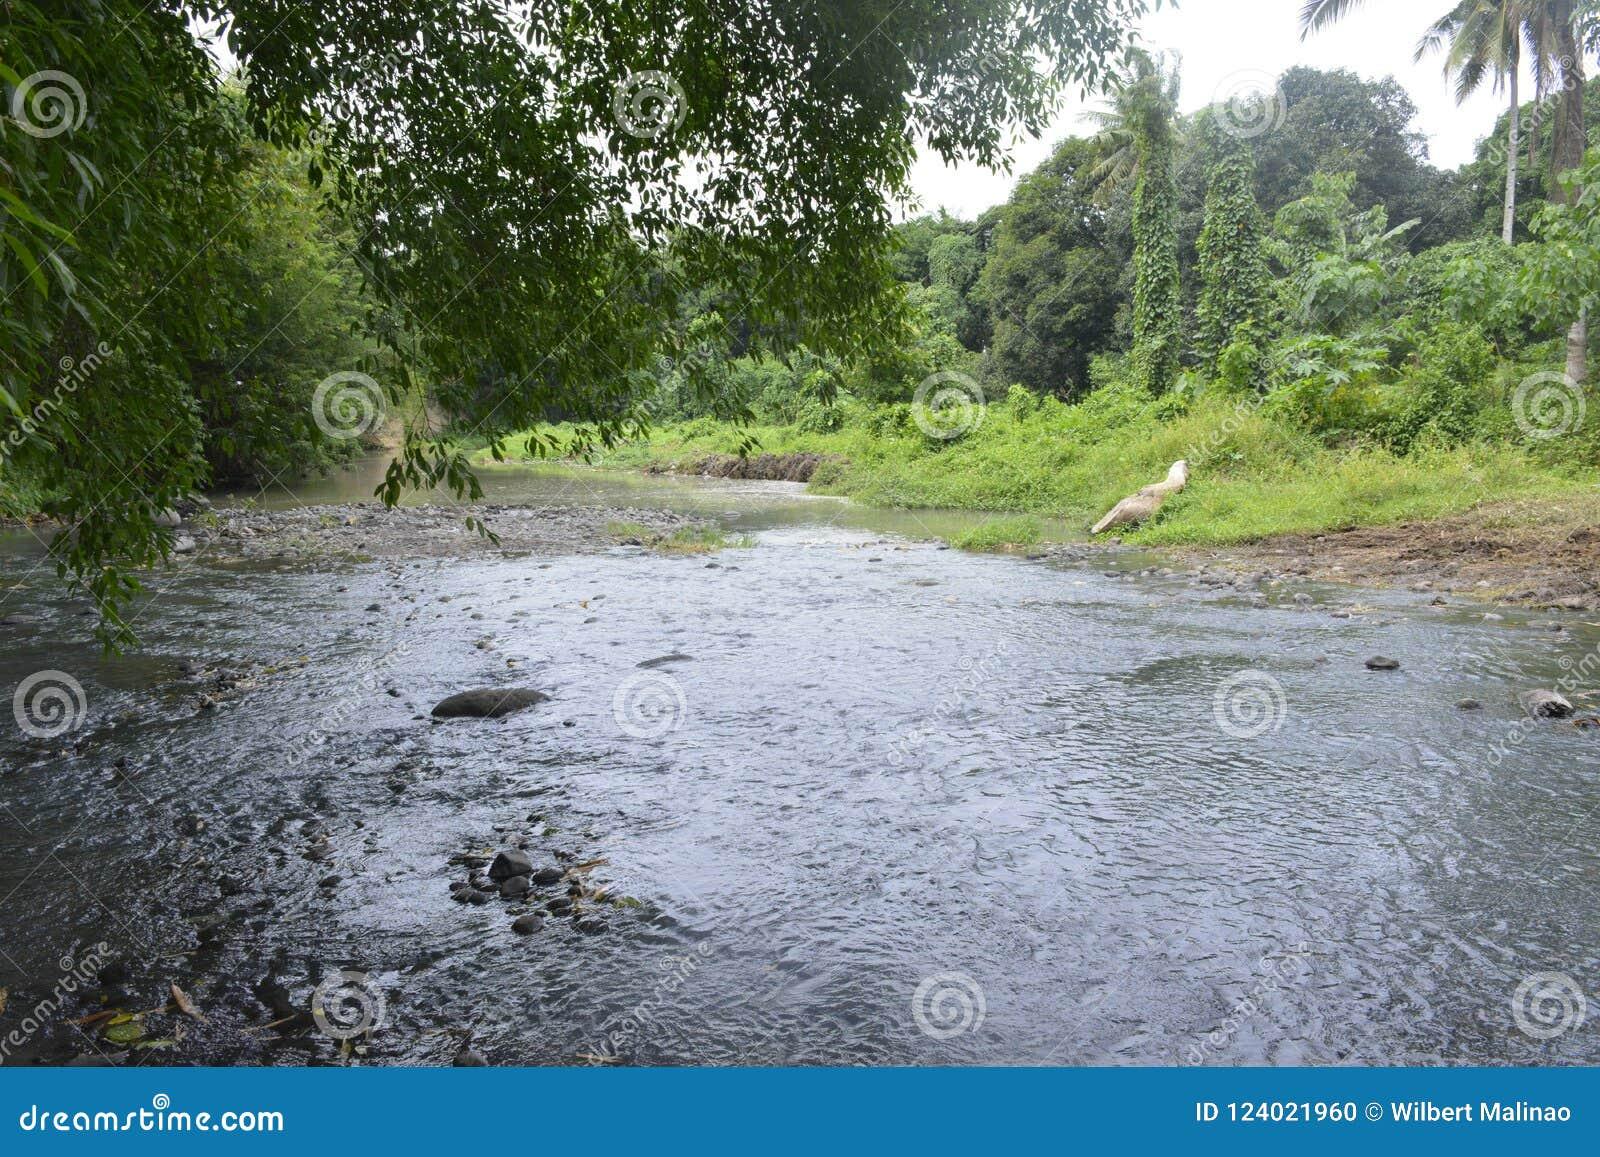 Rivière de Tiguman chez Tiguman barangay, ville de Digos, Davao del Sur, Philippines